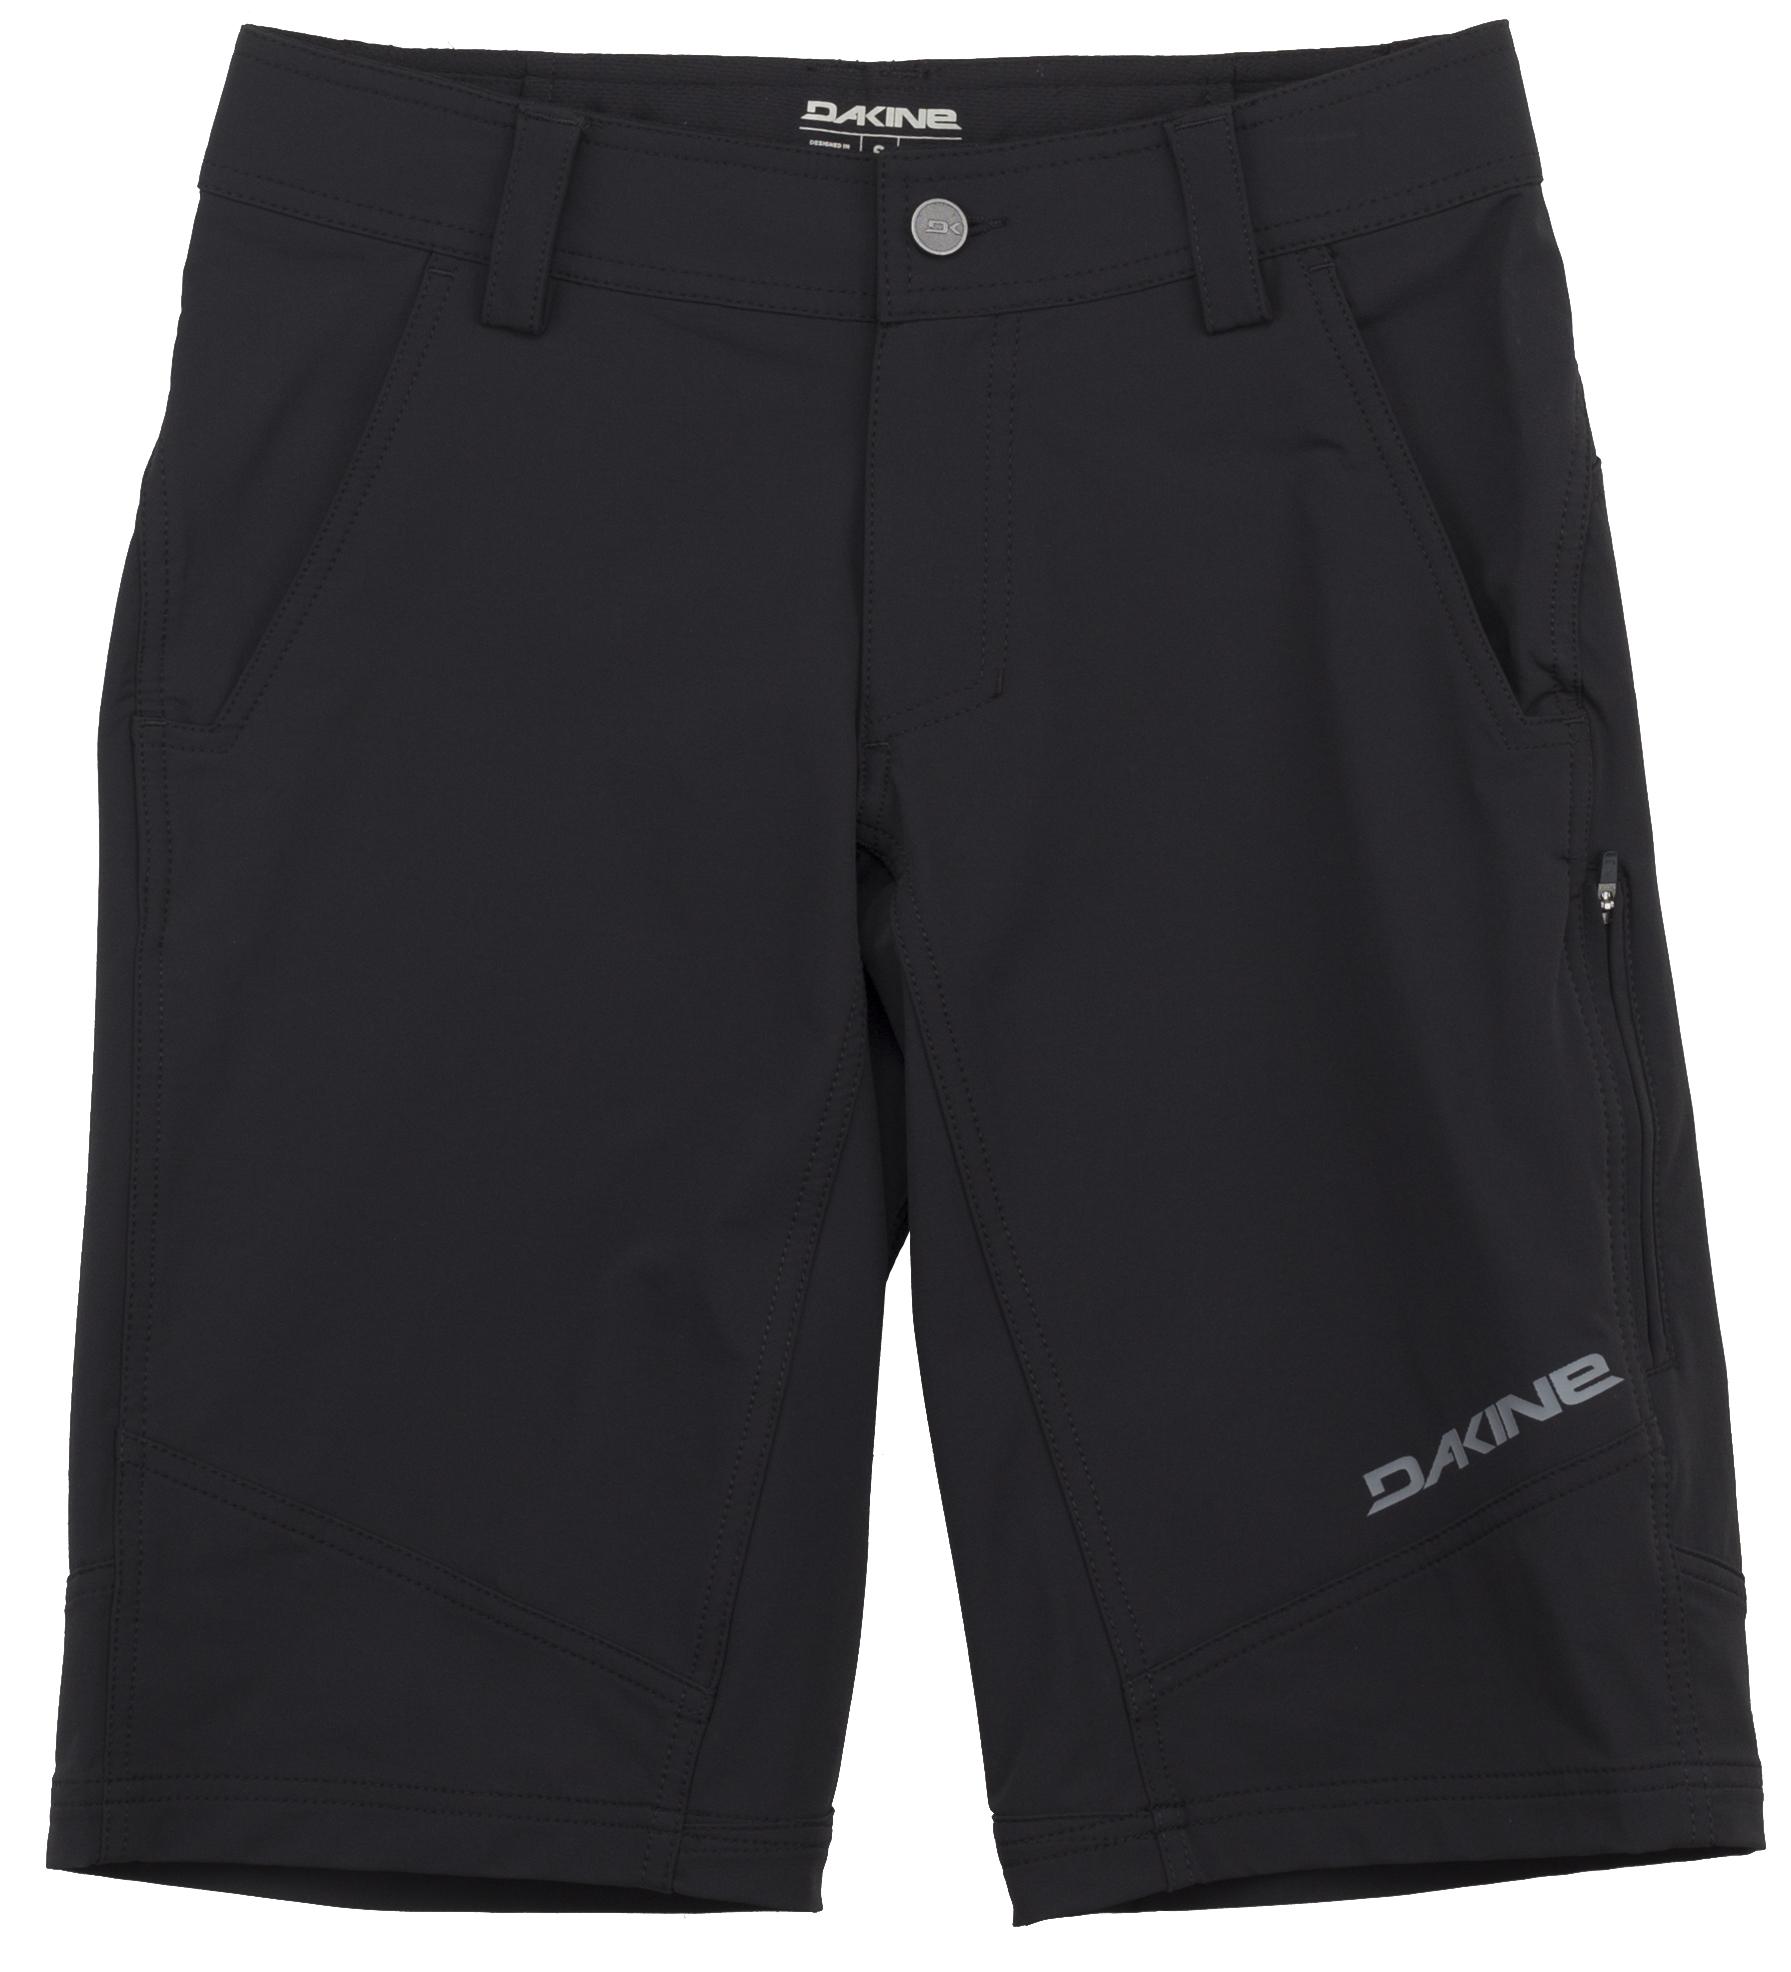 Dakine Dropout MTB Shorts